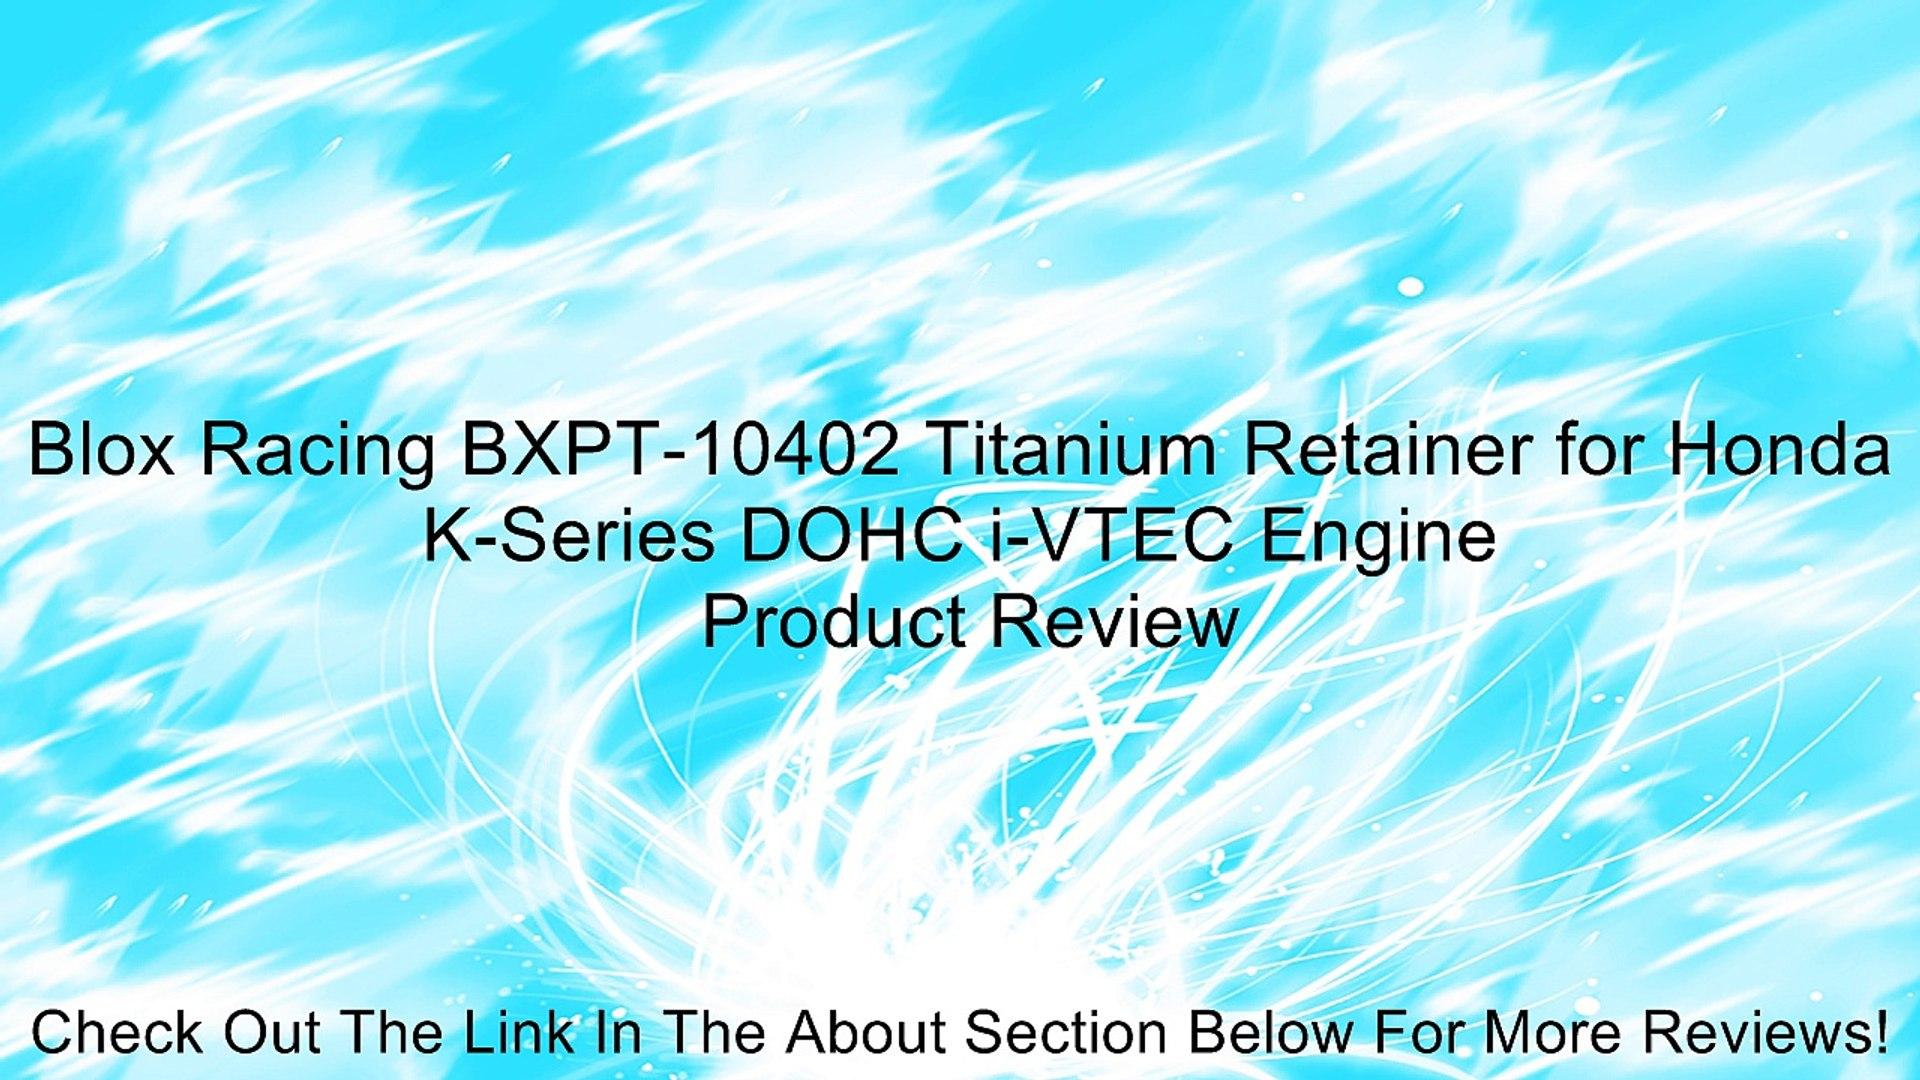 Blox Racing BXPT-10402 Titanium Retainer for Honda K-Series DOHC i-VTEC Engine